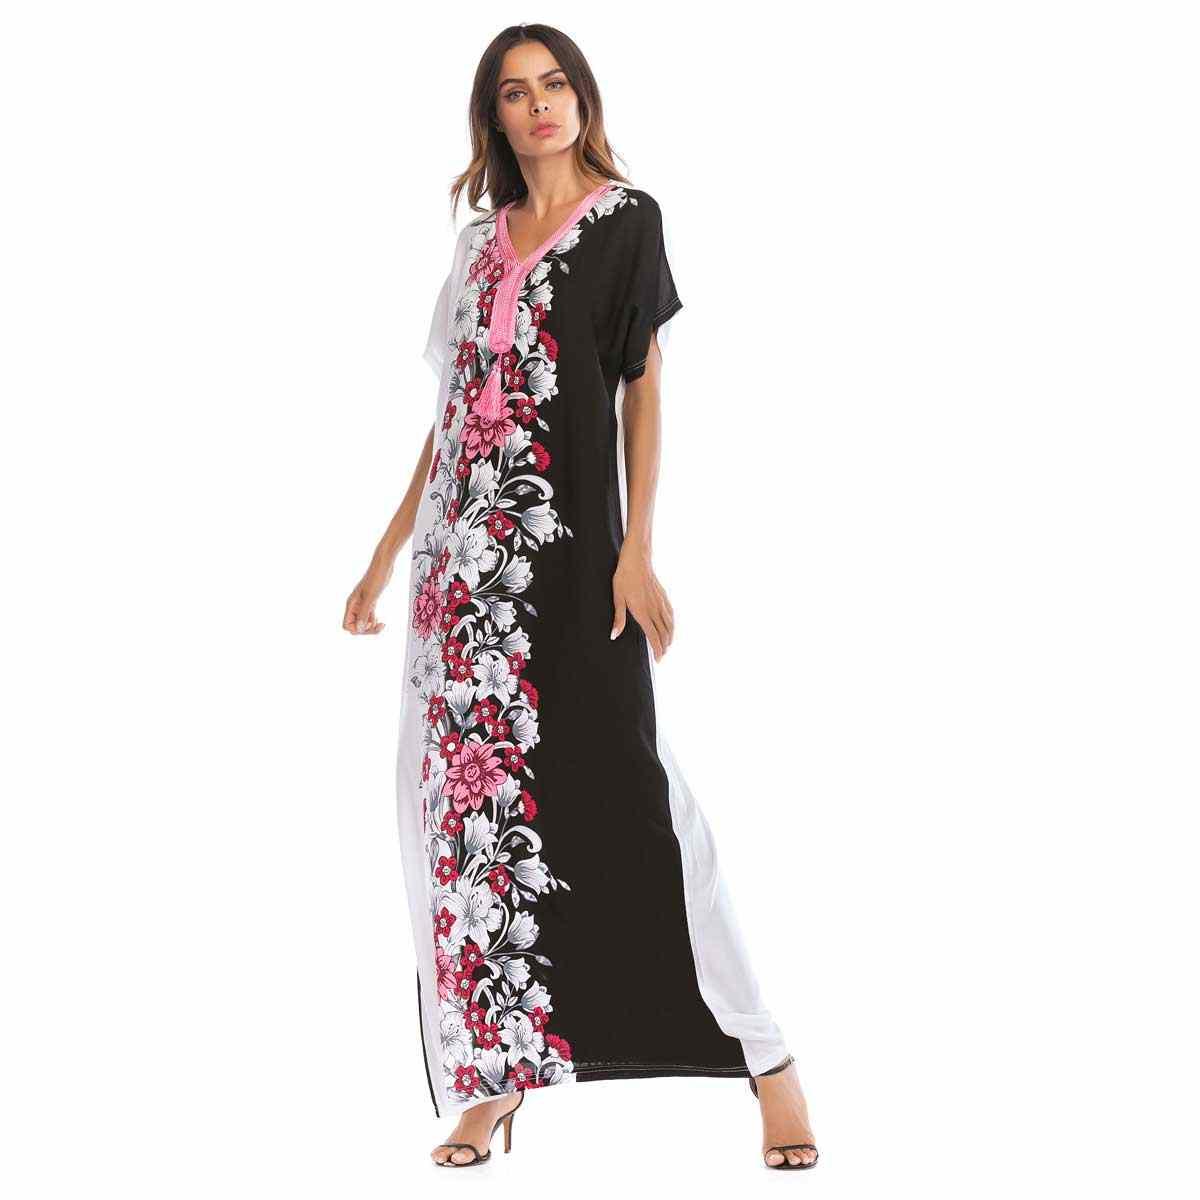 a155e39836 Siskakia Ramadan Must Haves Muslim Solid Fashion Weekend Abaya Dress ...